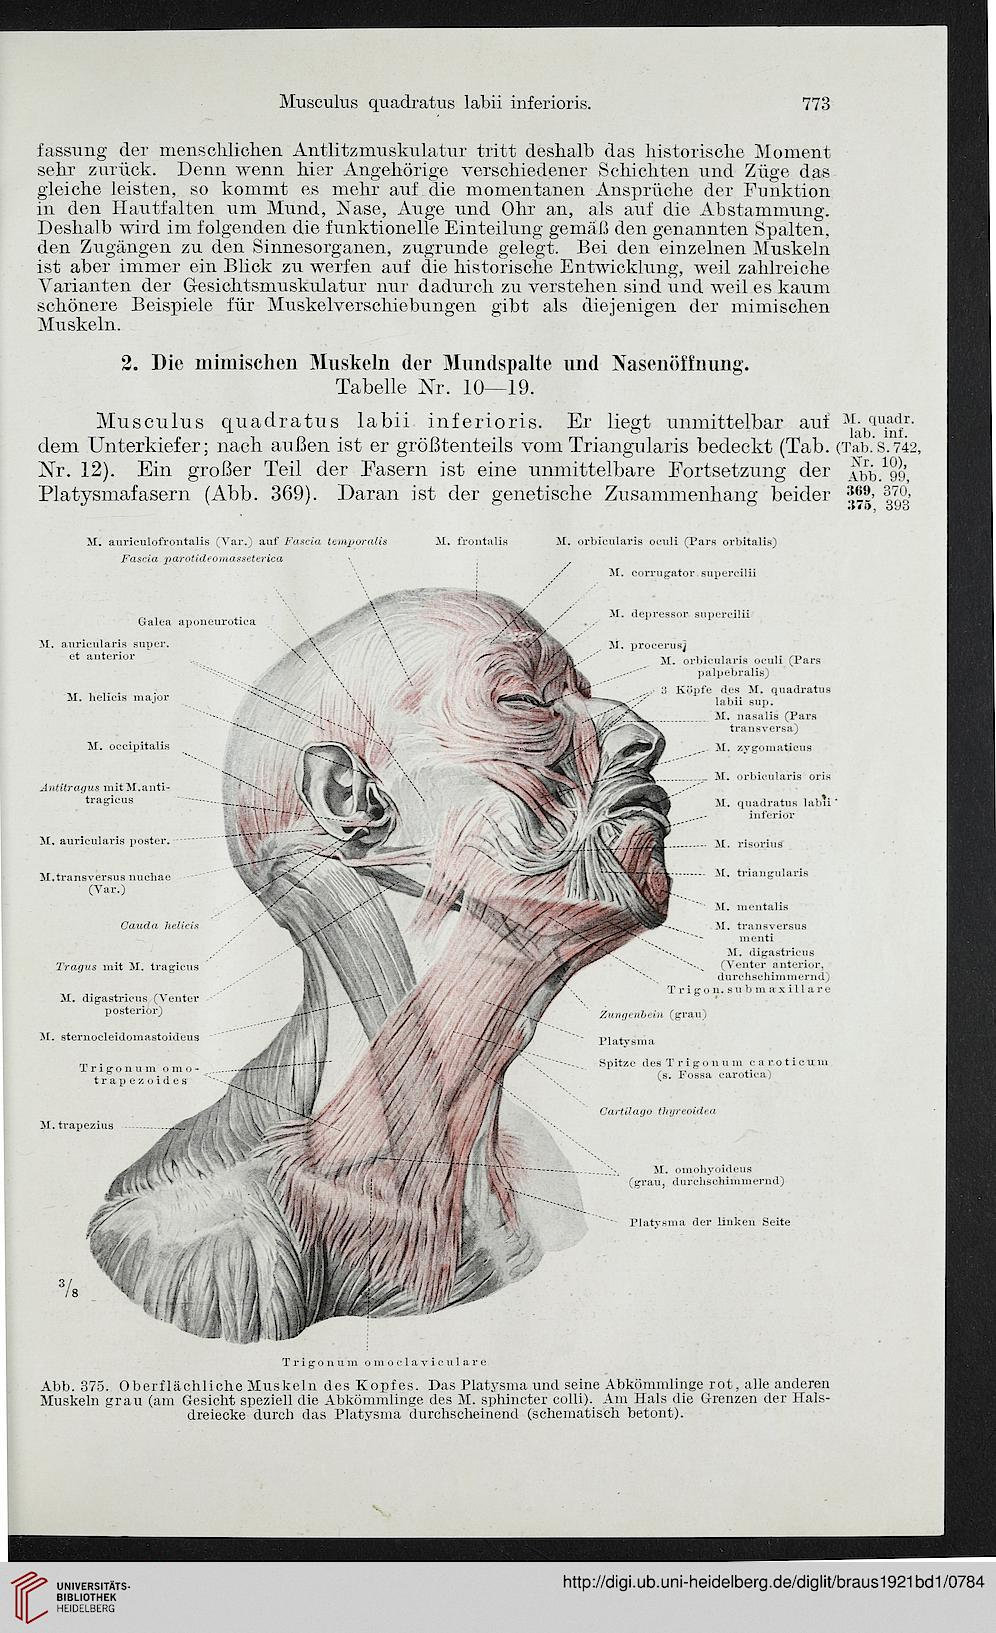 Ziemlich Alex Grau Anatomie Kunst Ideen - Anatomie Ideen - finotti.info